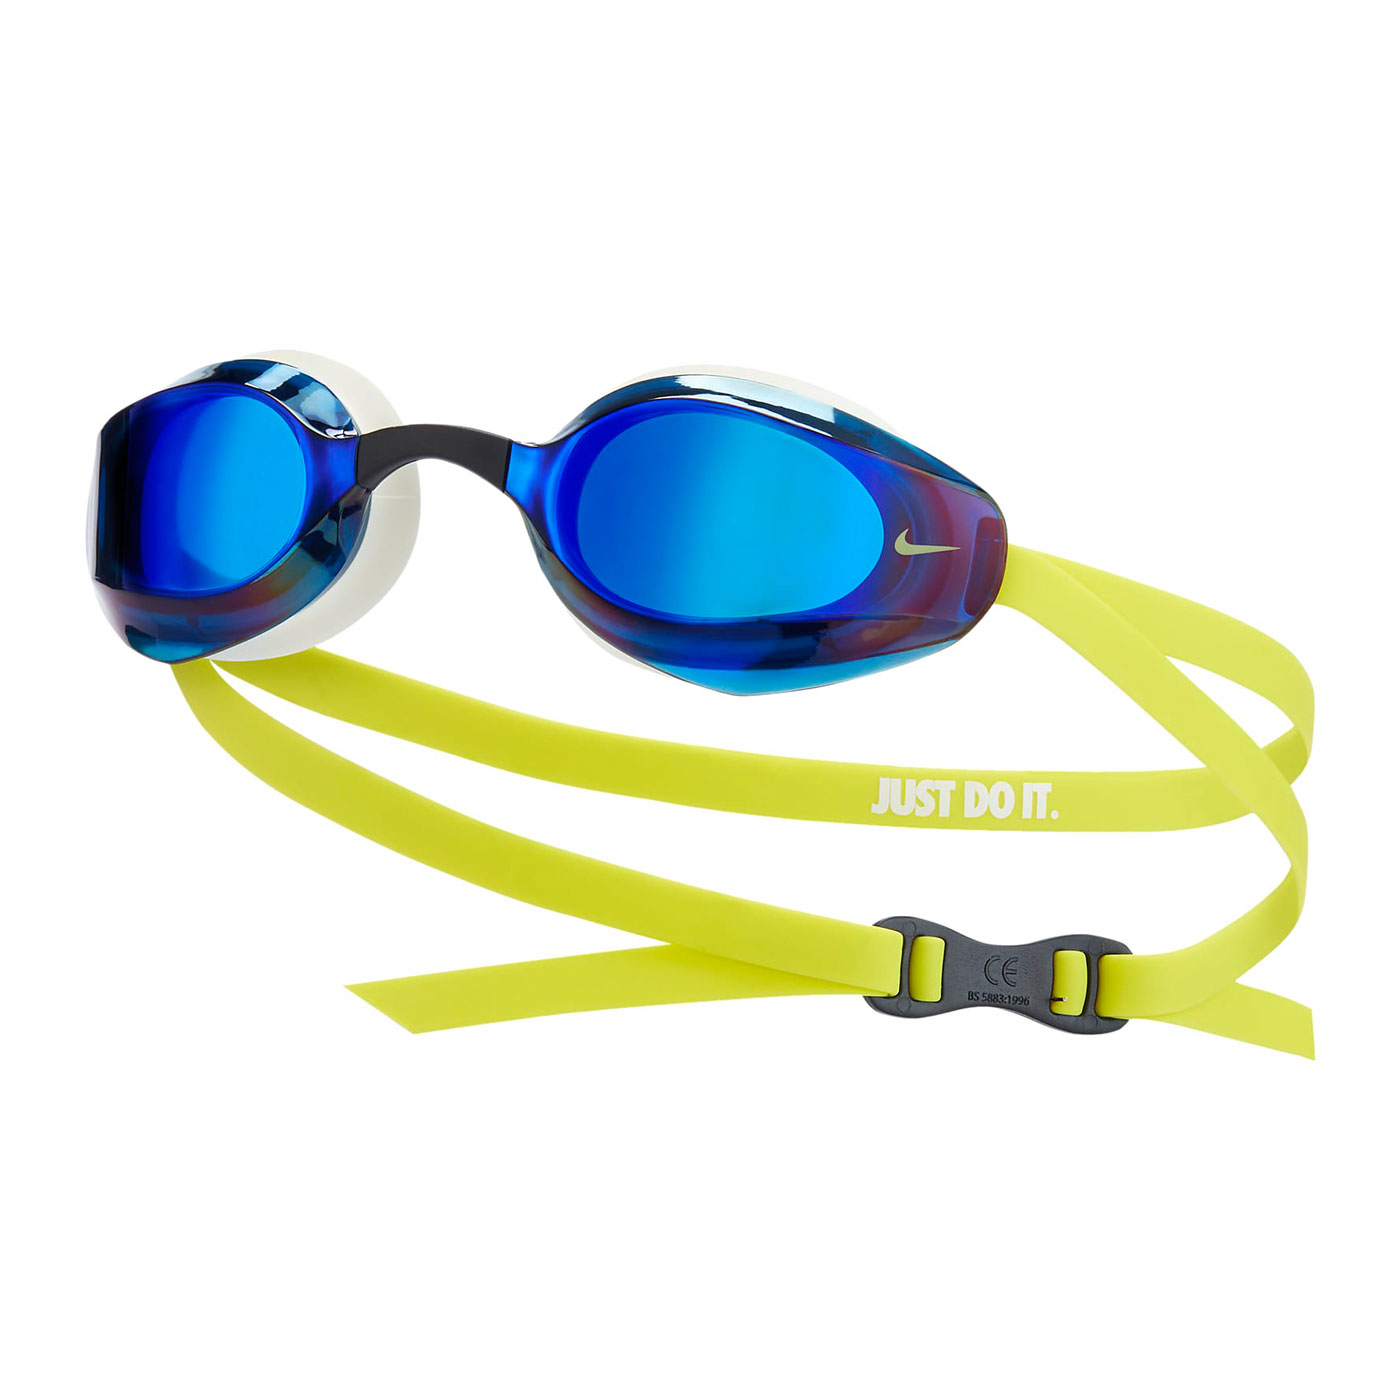 NIKE SWIM 成人專業型鏡面泳鏡 NESSA176-990 - 白藍黃